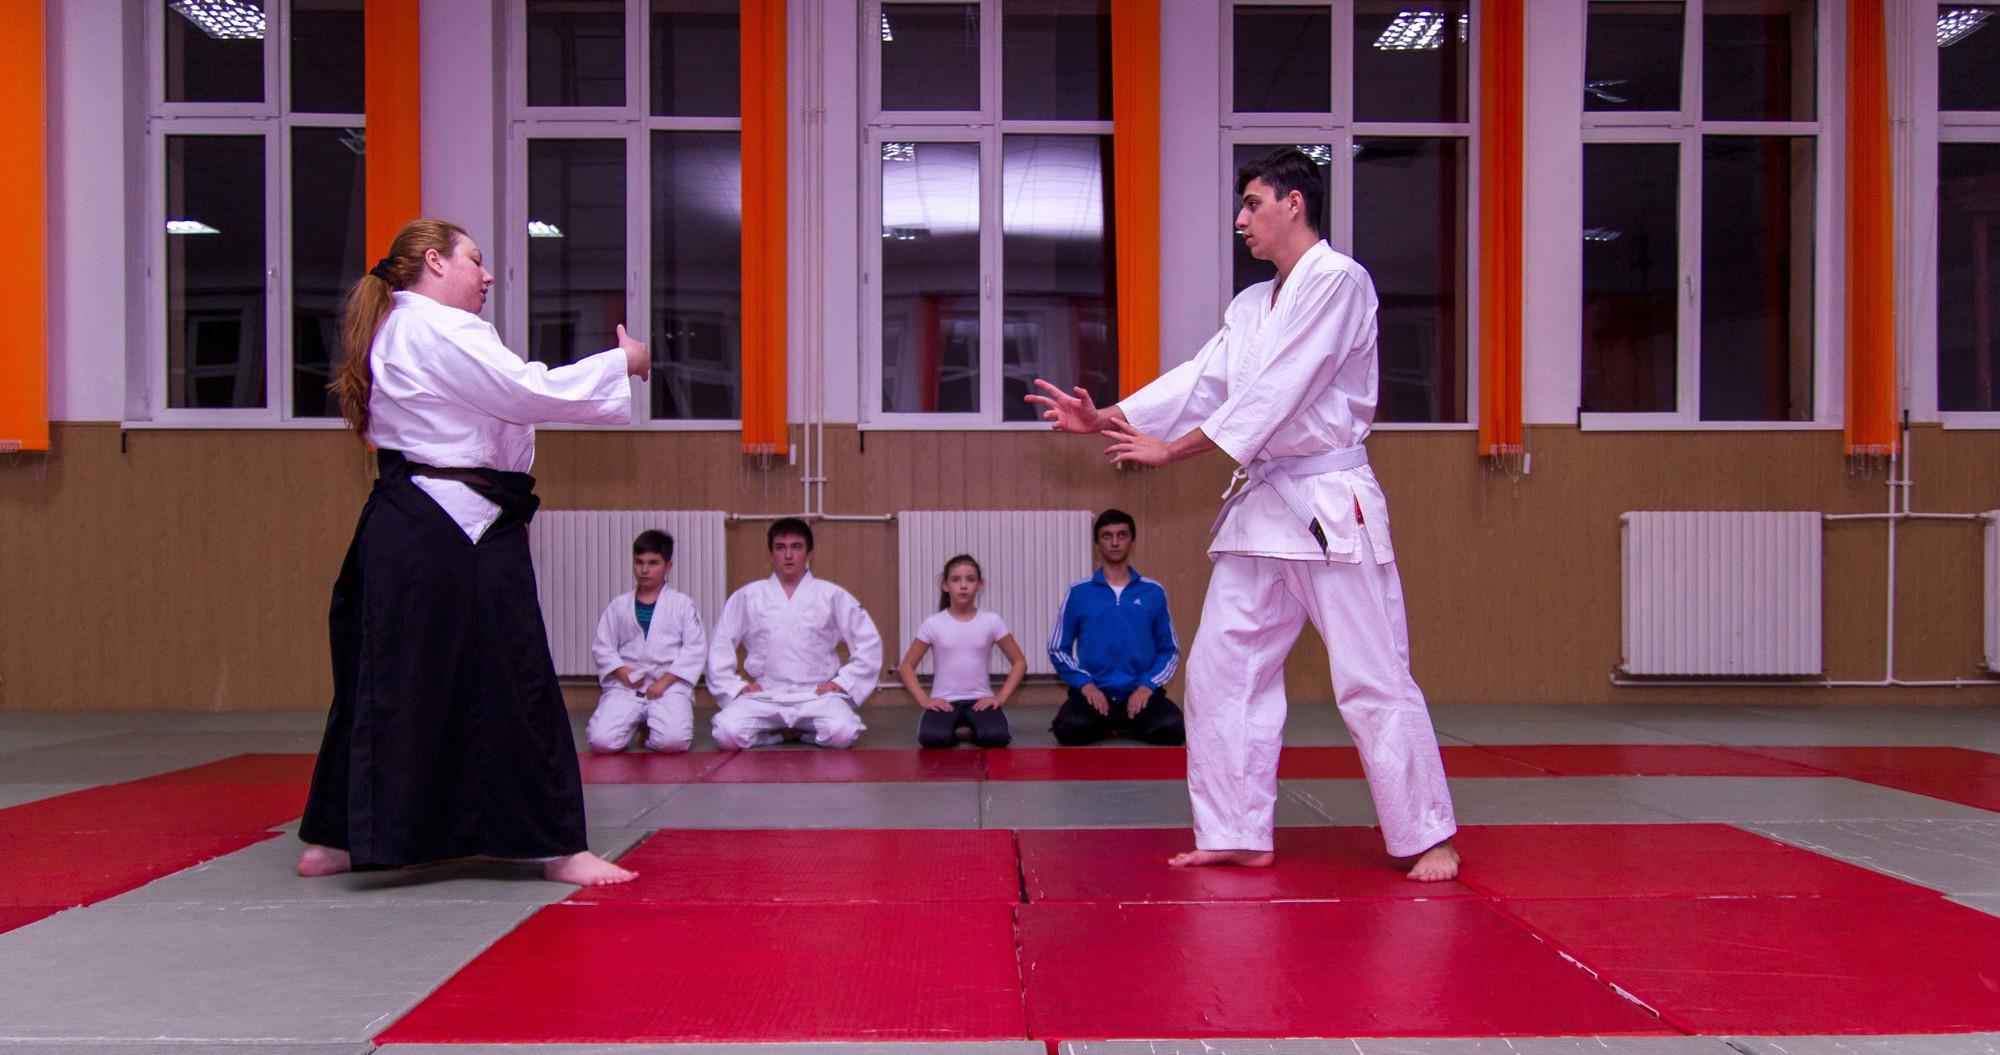 Japanese culture influences Bucharest's life